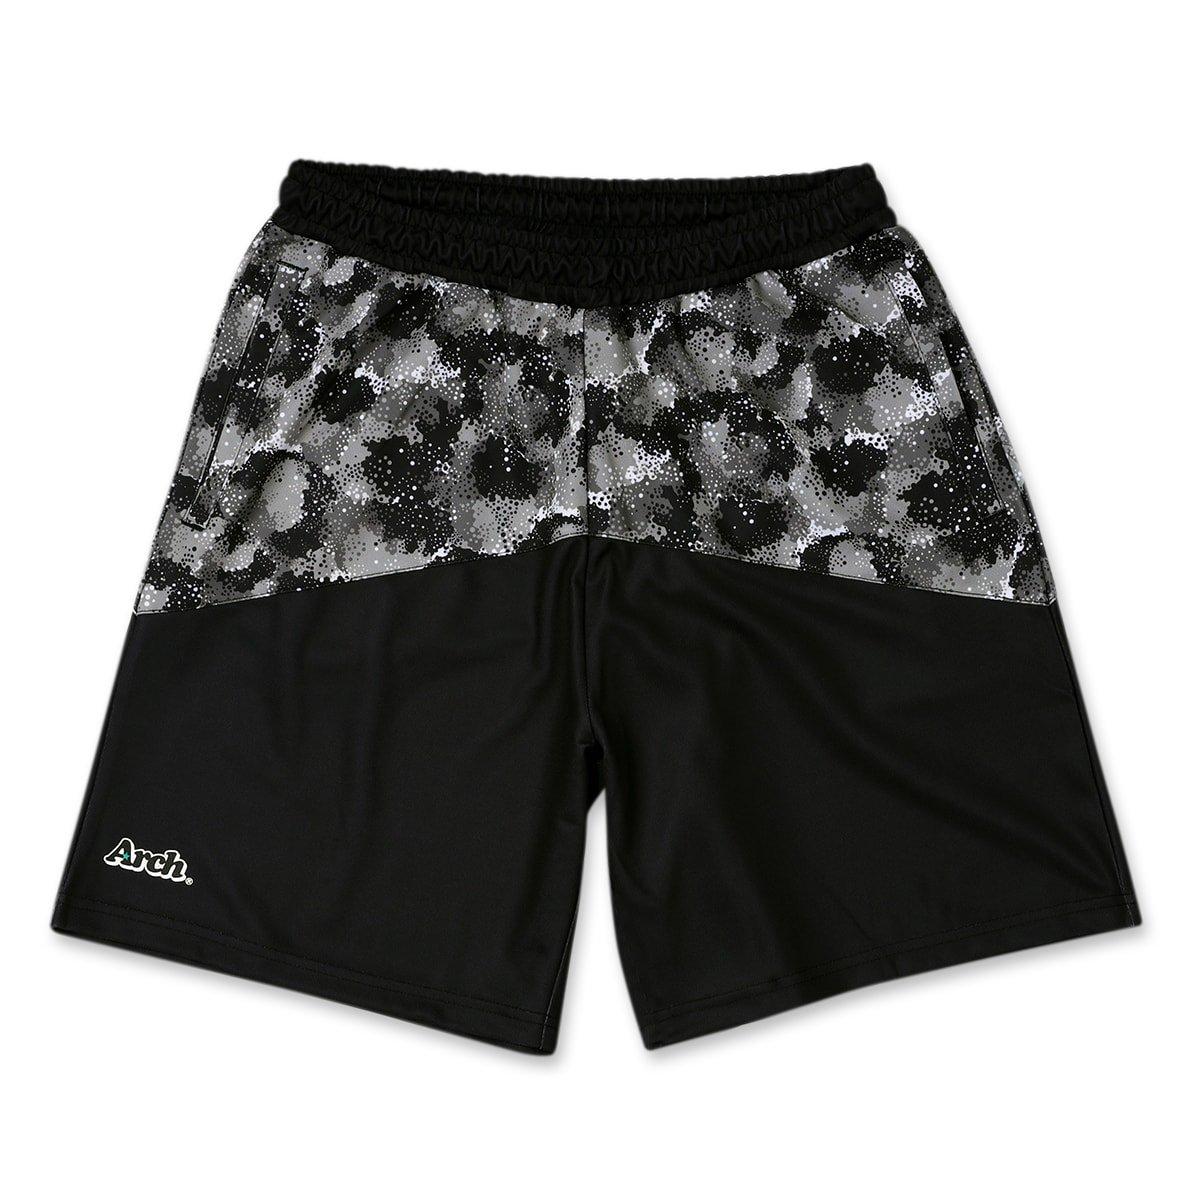 spray camo shorts【black】